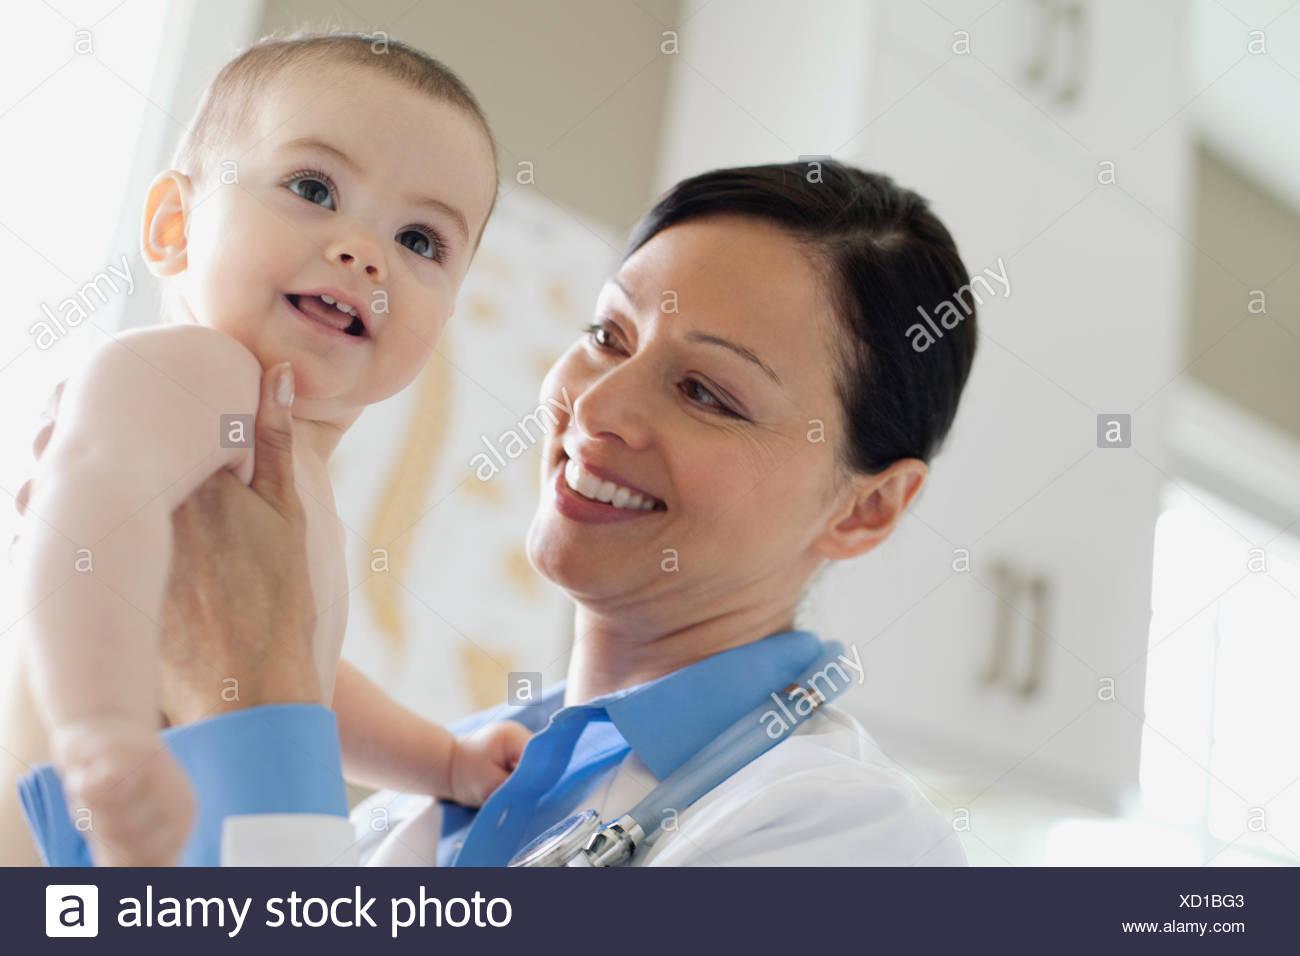 doctor examining baby - Stock Image